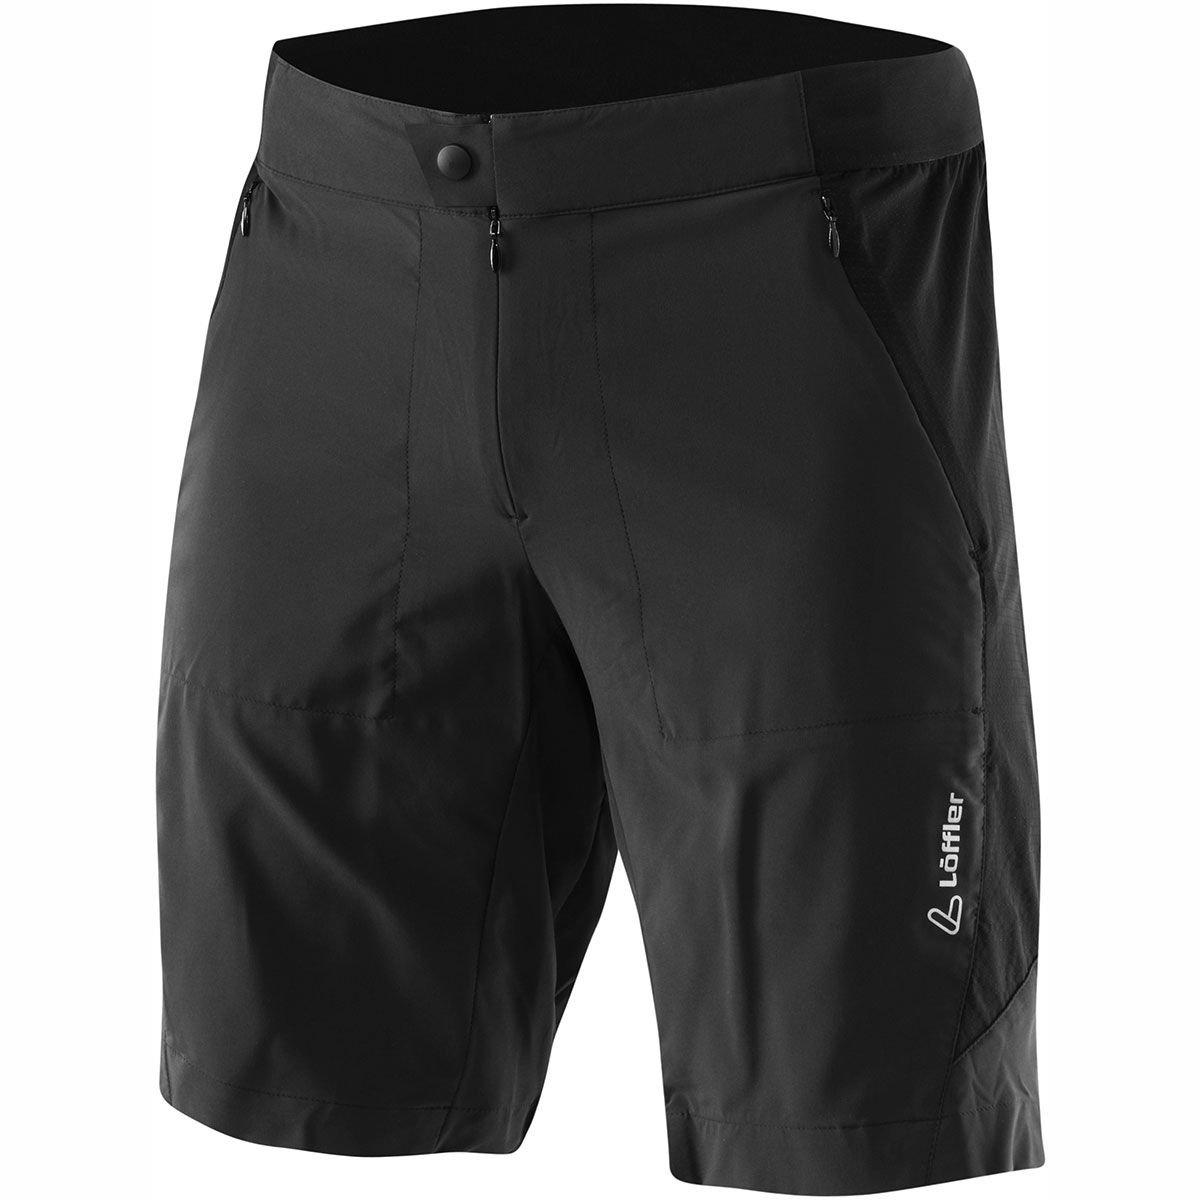 LÖFFLER He. Bike Shorts Superlitano